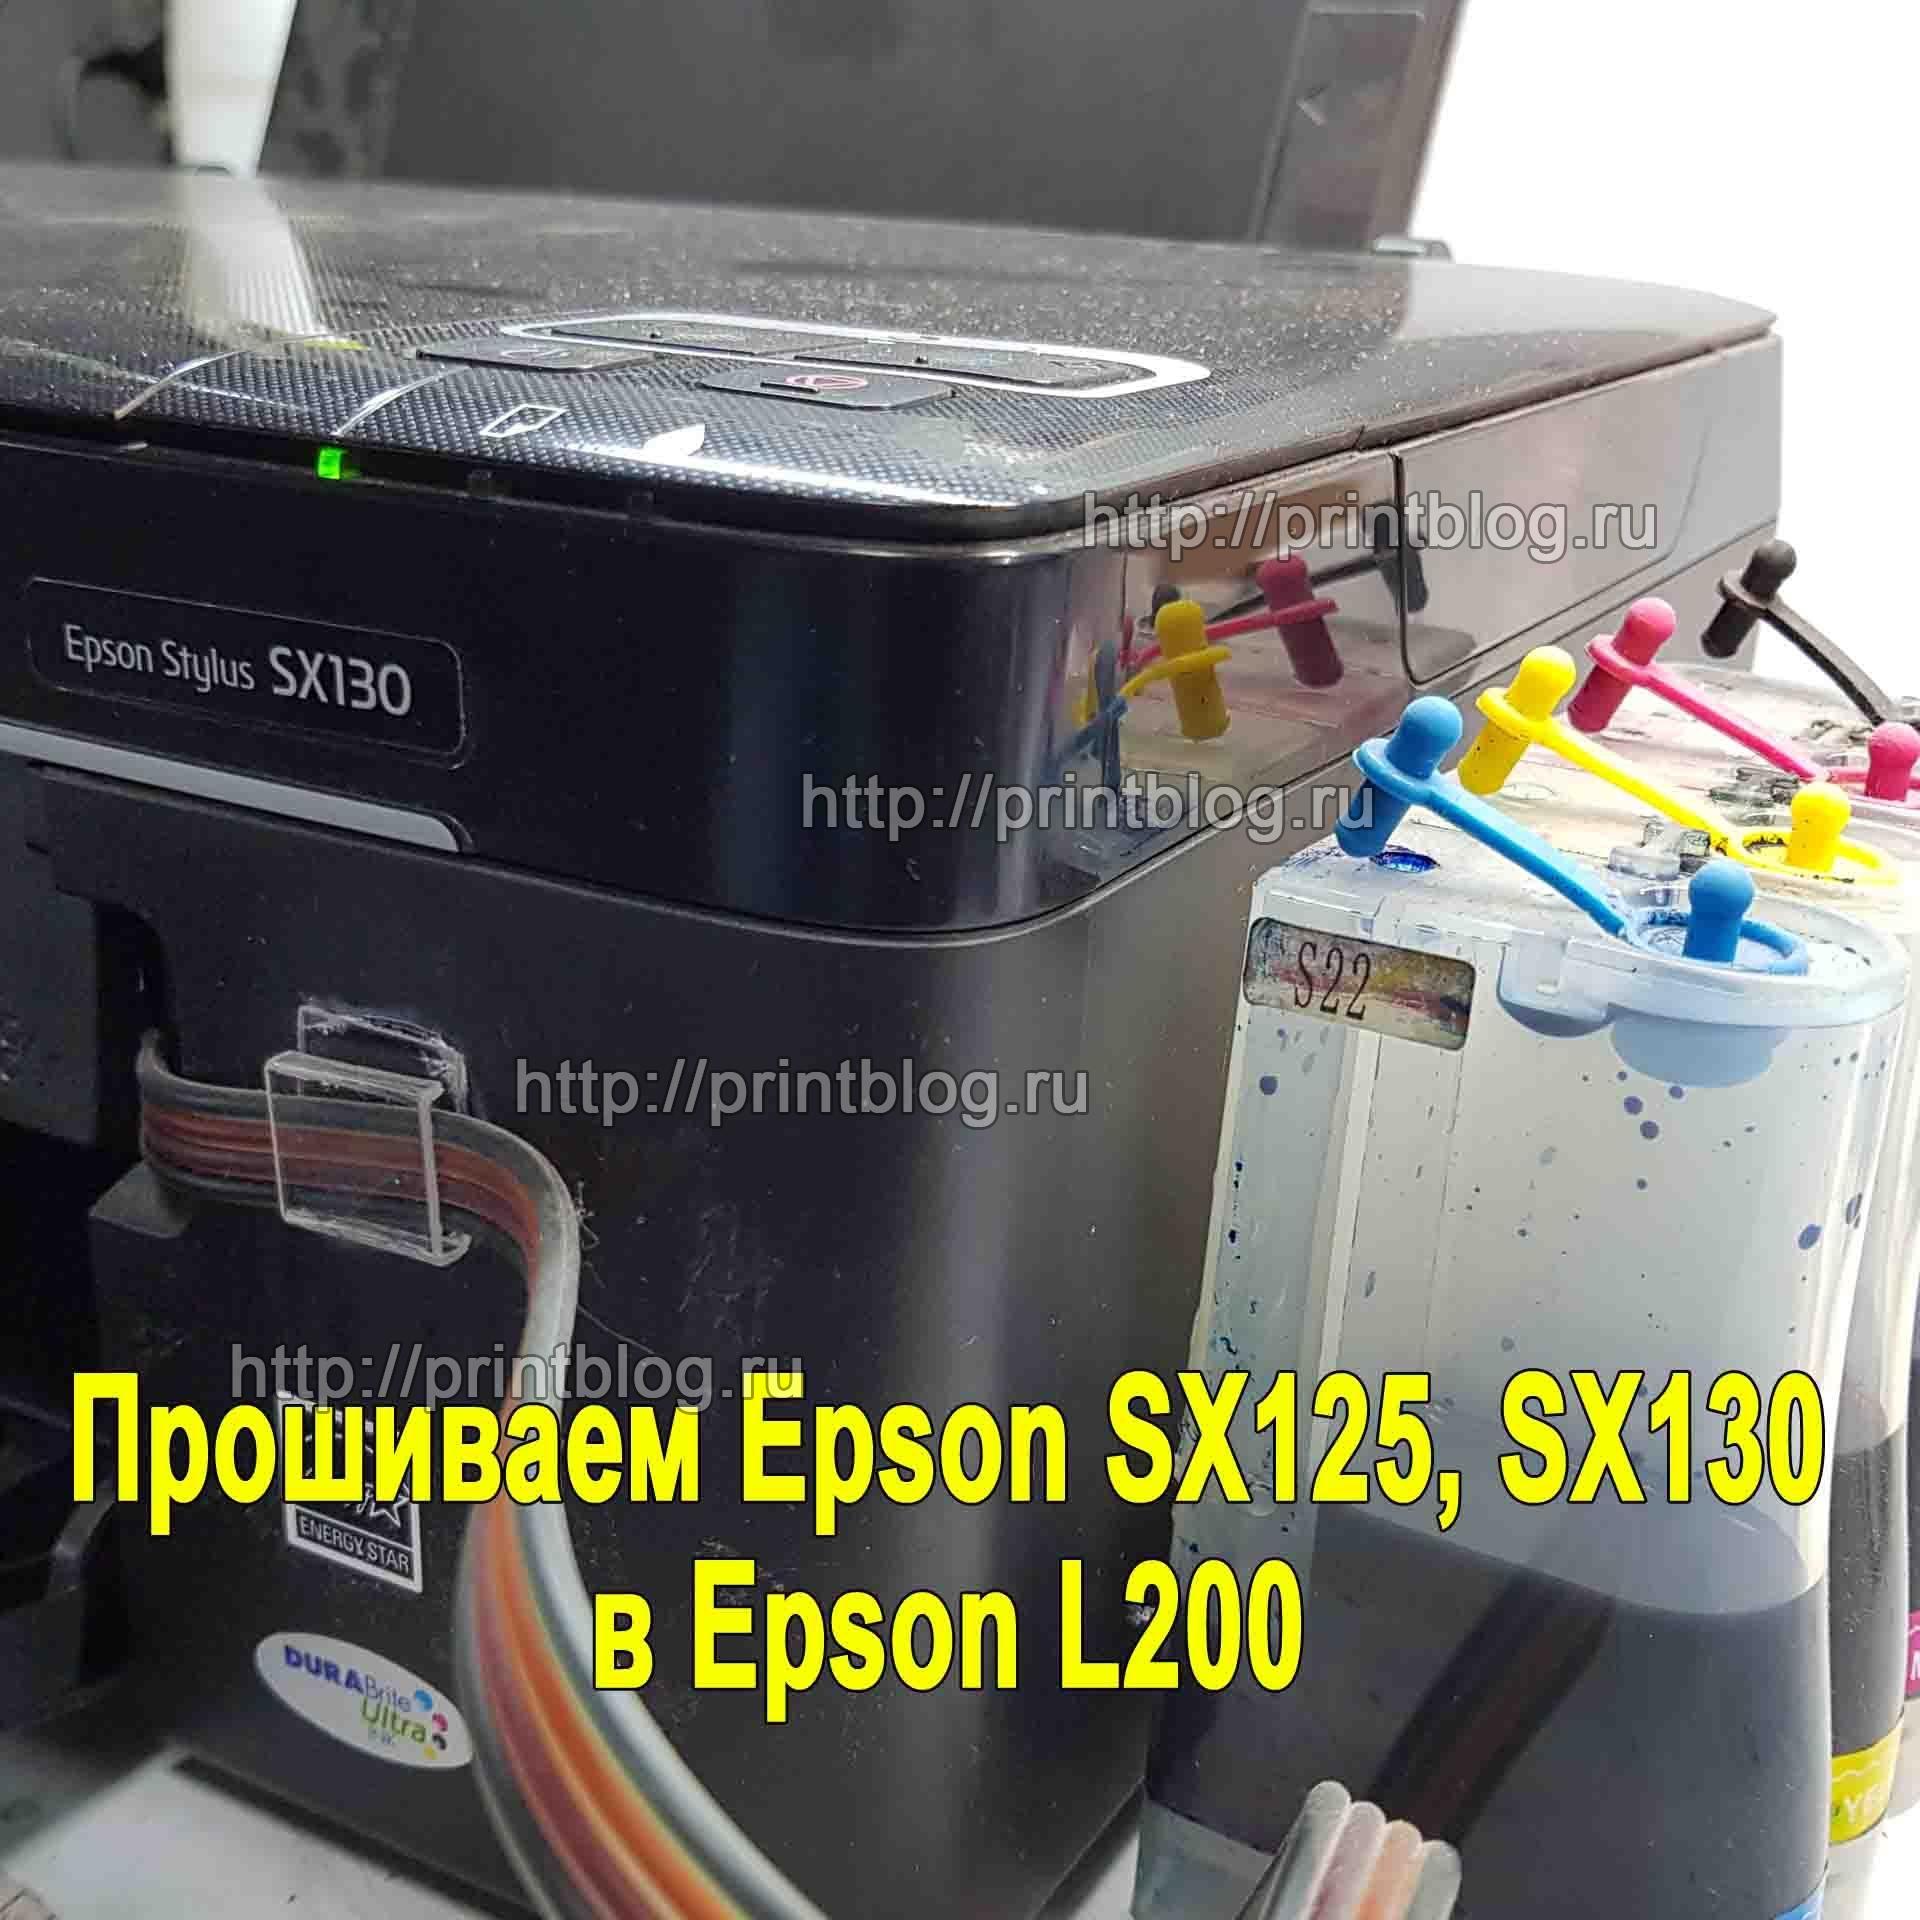 Переделываем (прошиваем) Epson SX125, SX130 в Epson L200